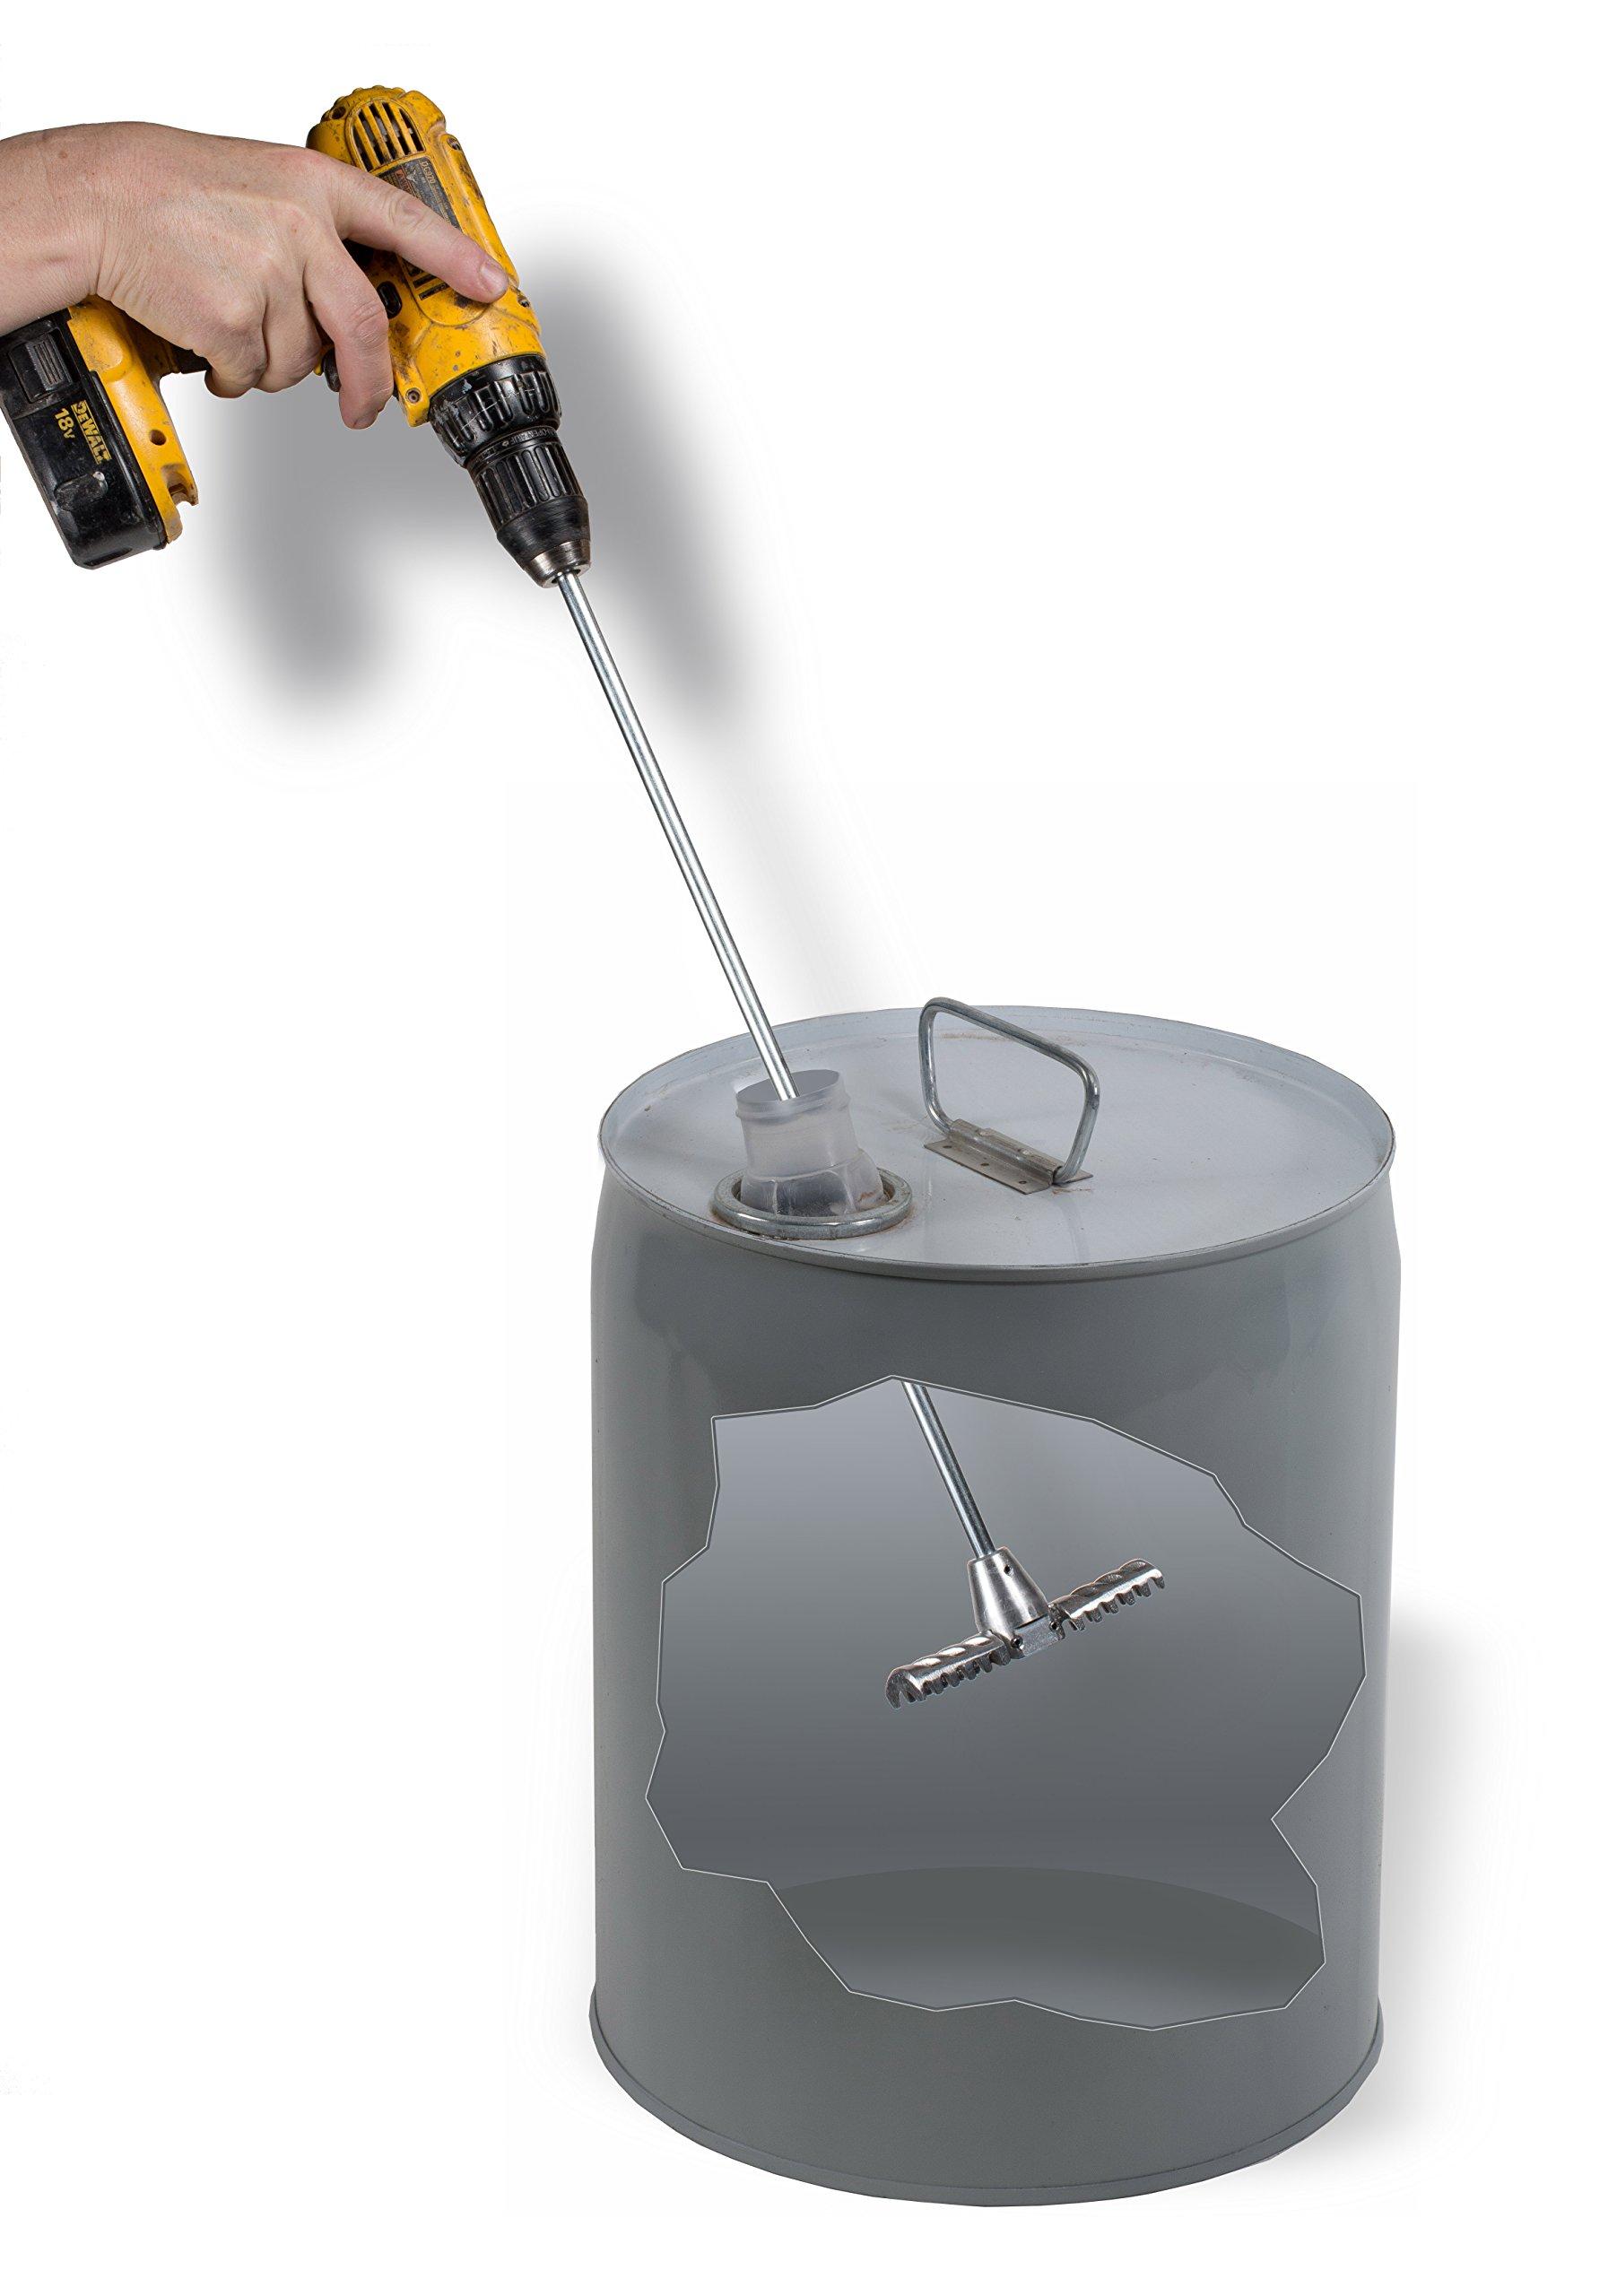 Hanson Plunge T-5 5 Gallon mixer